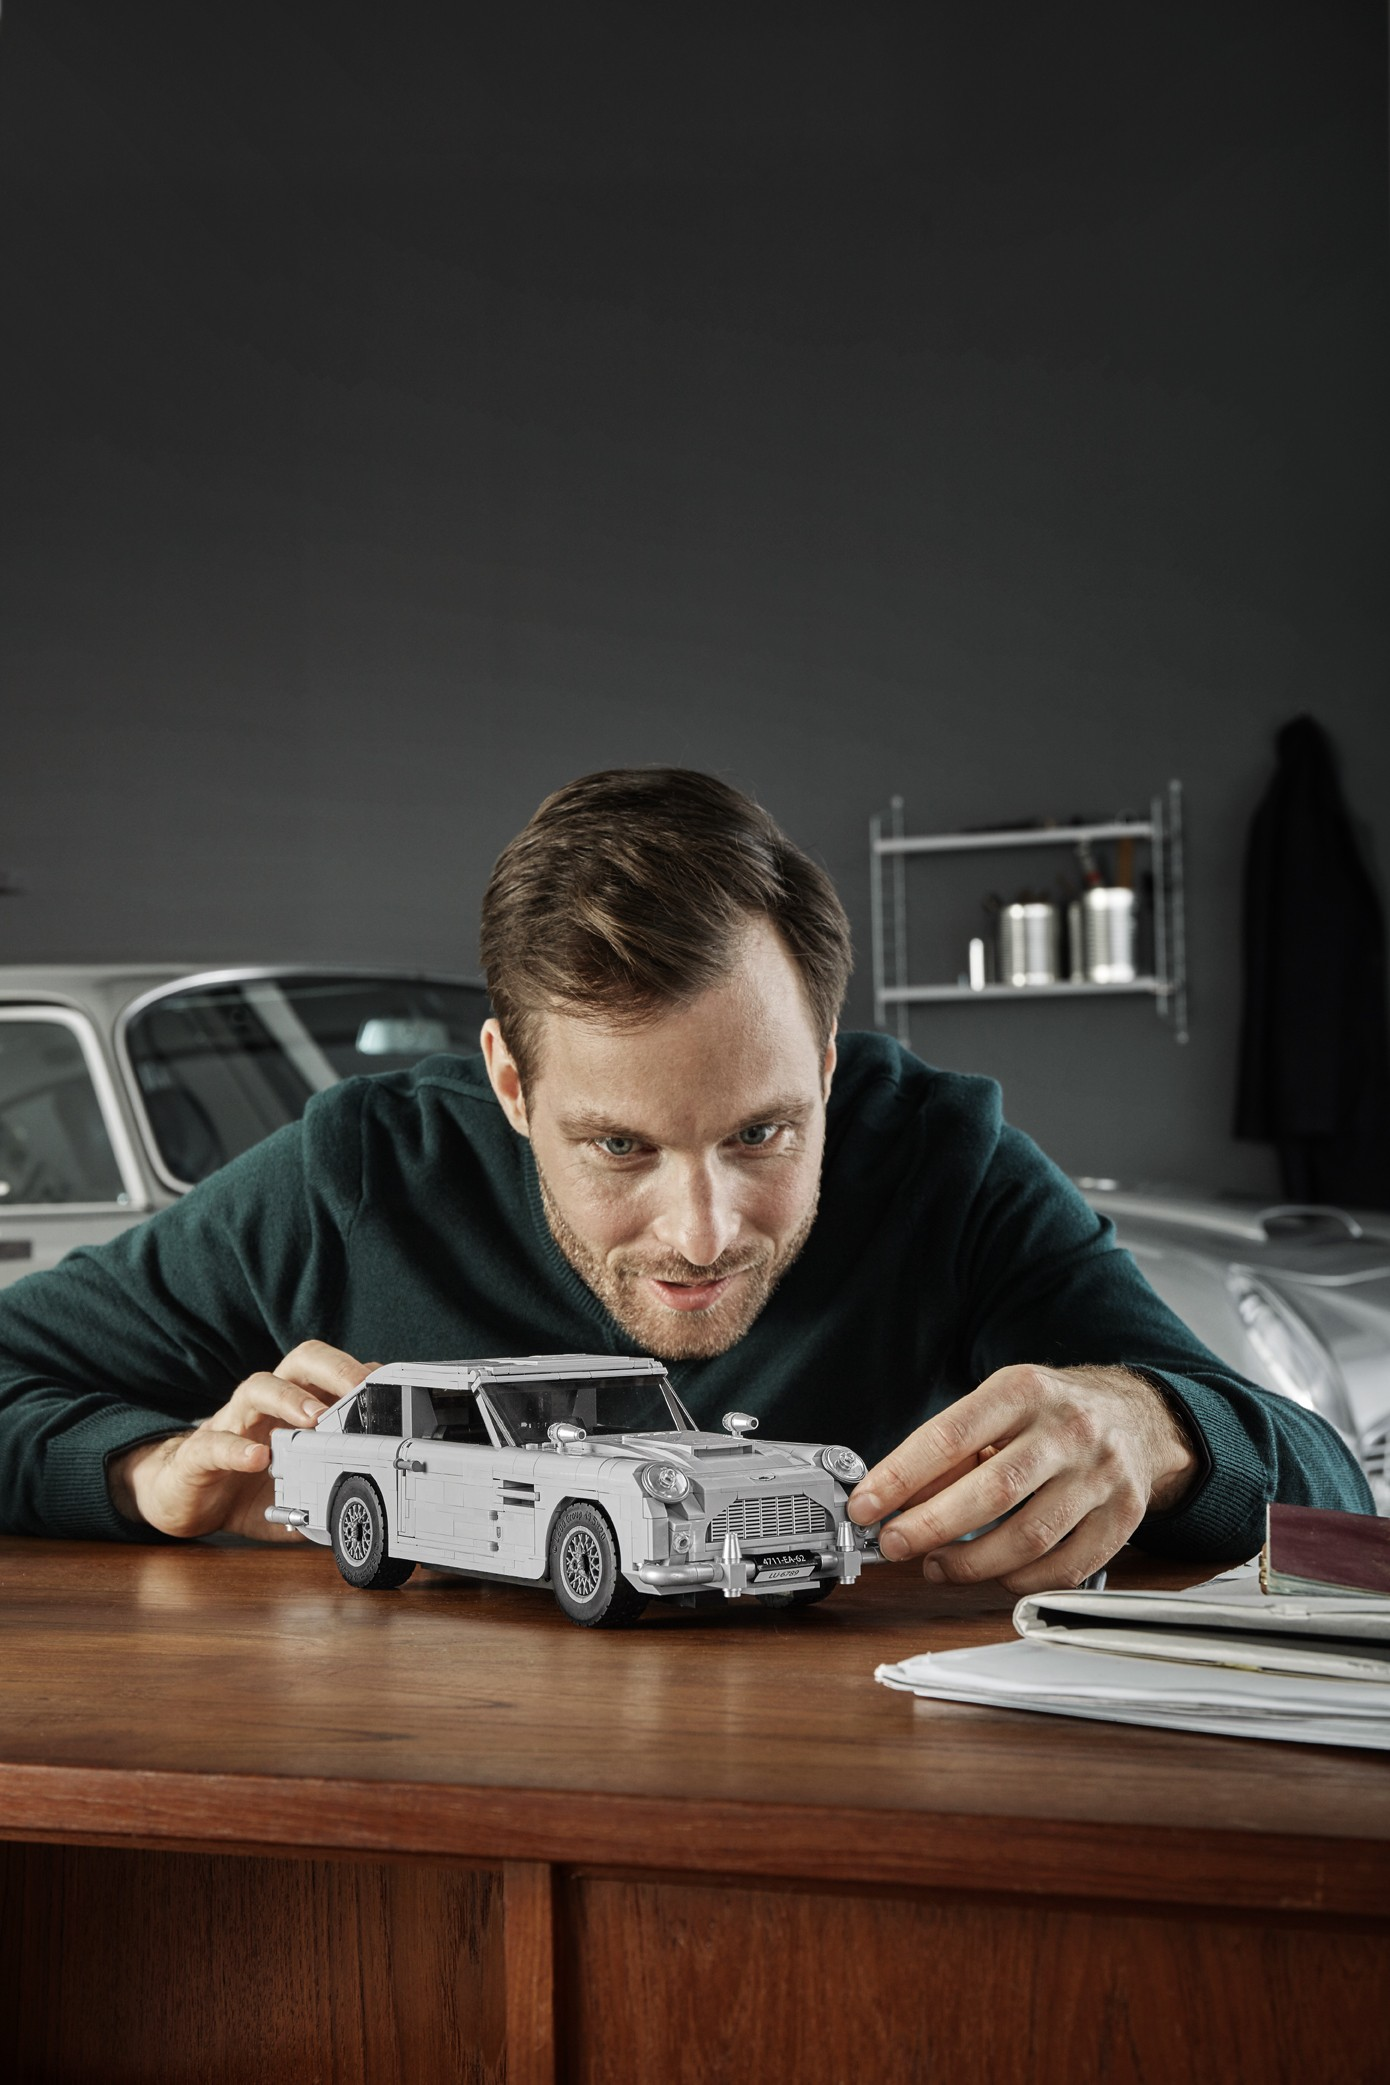 Lego Aston Martin DB5 (22)